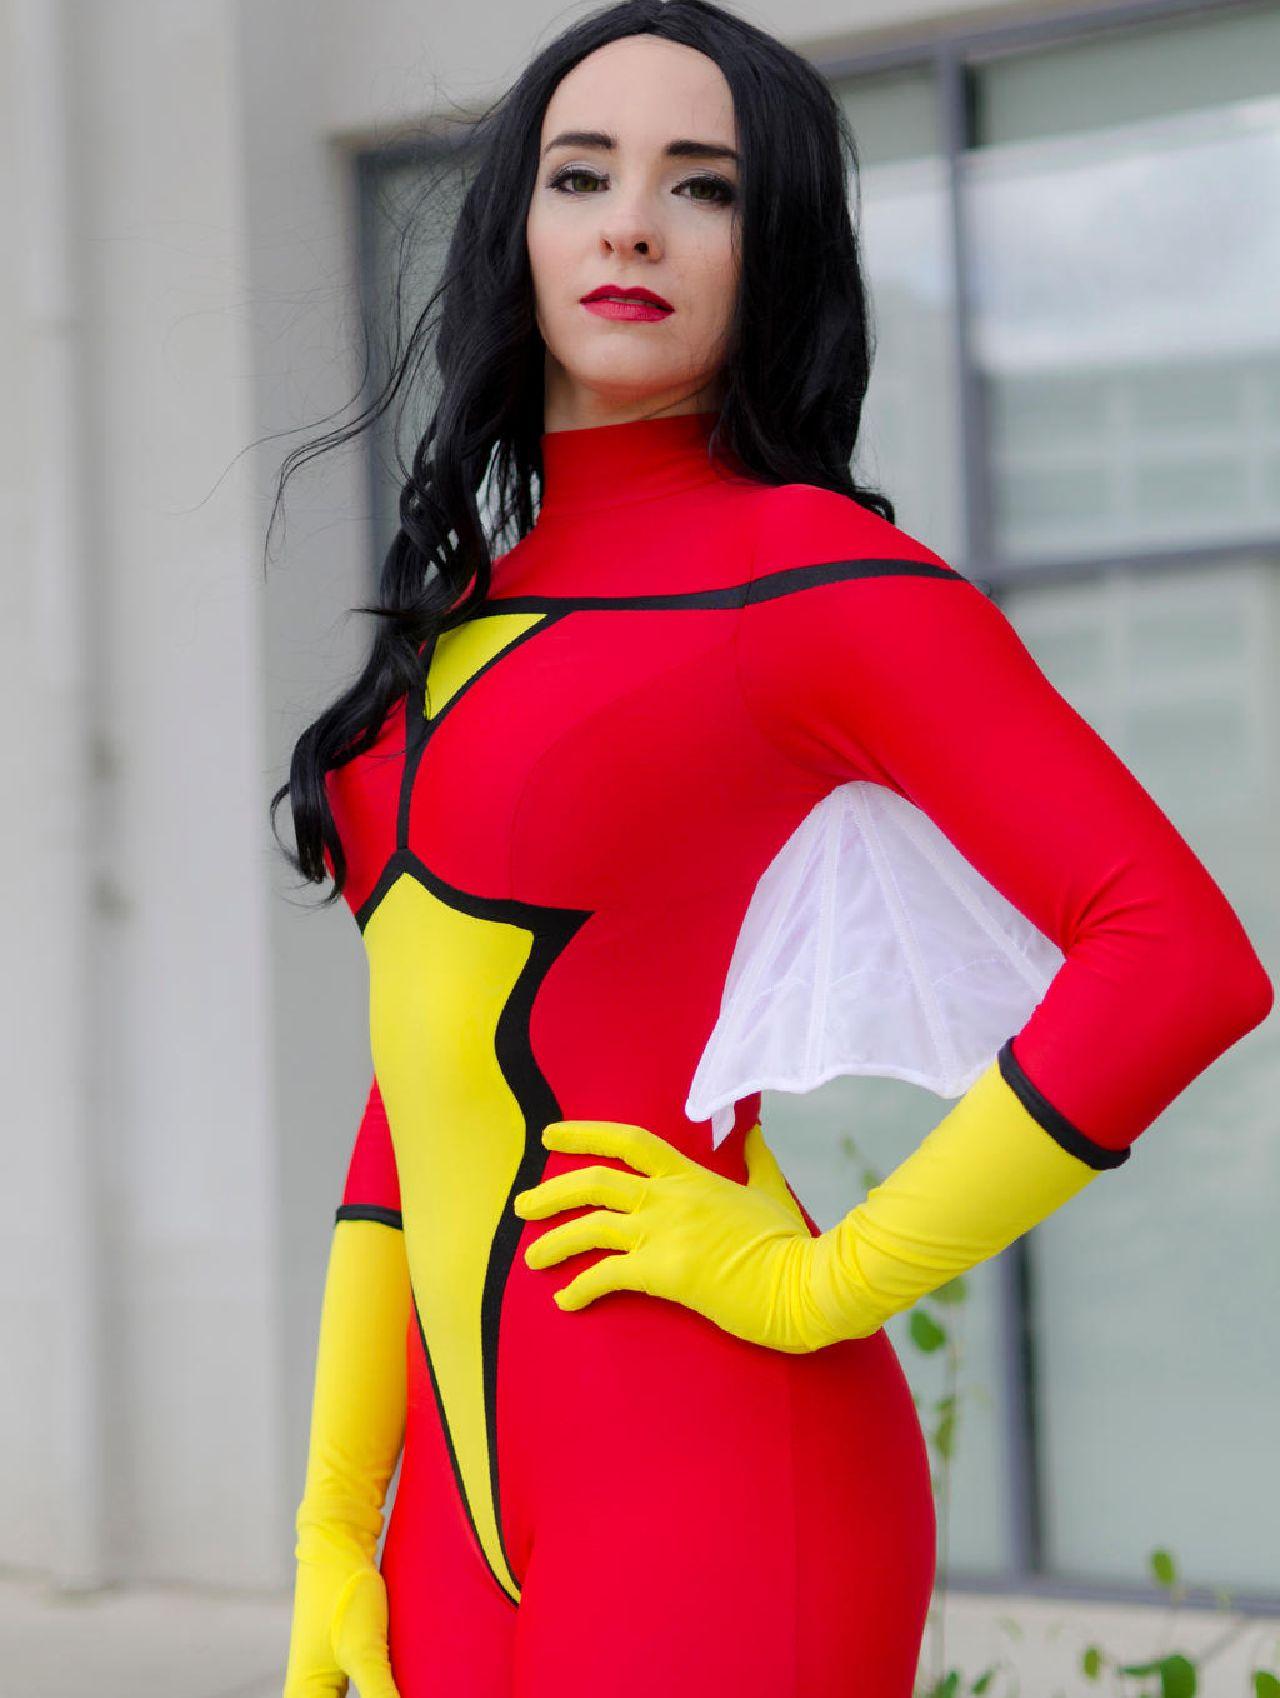 marvel comics spider woman